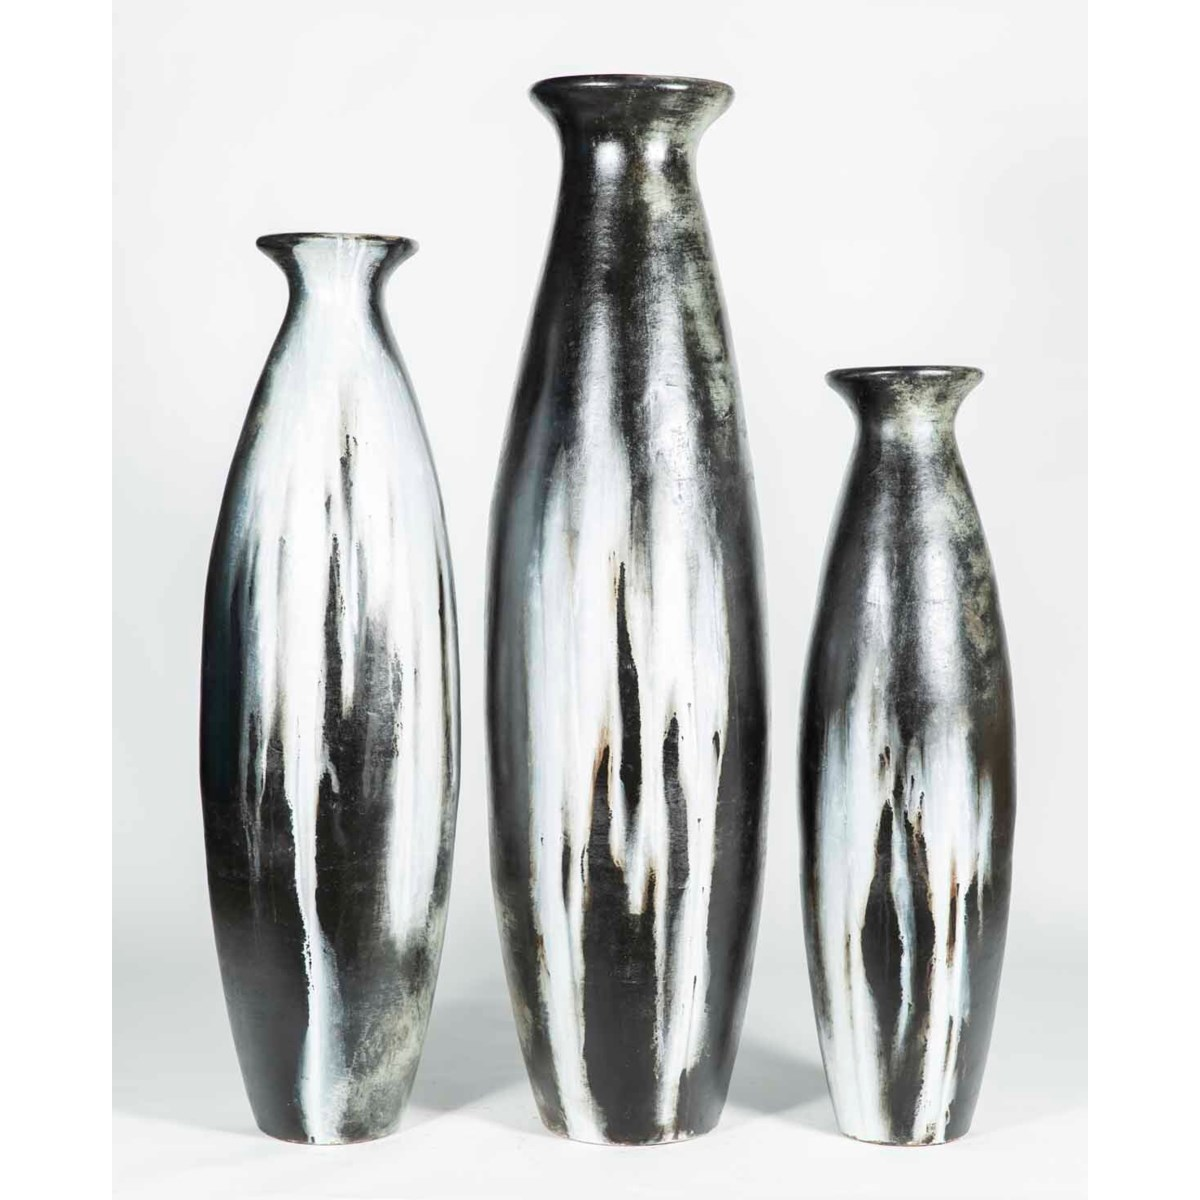 Set of 3 Floor Bottles in Cascade Gray Finish